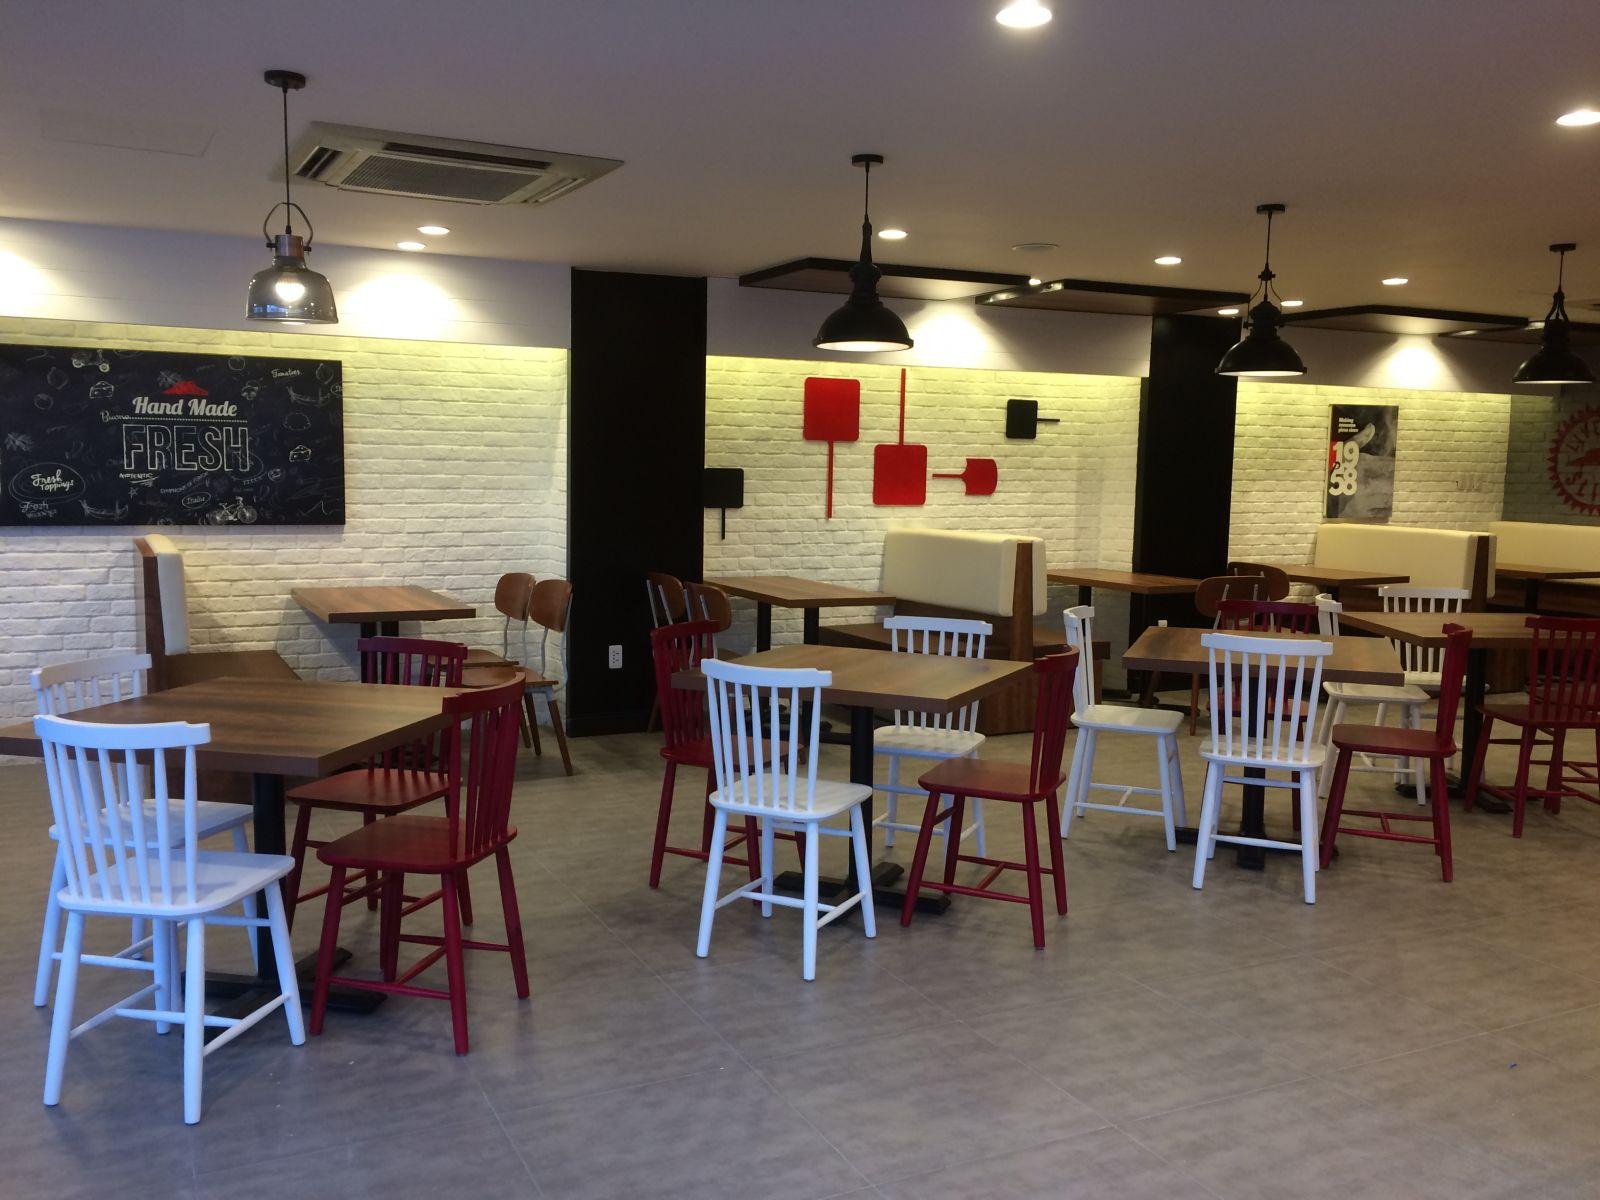 Đa-thi-cong-Pizza-Hut-Phan-Xich-Long-1